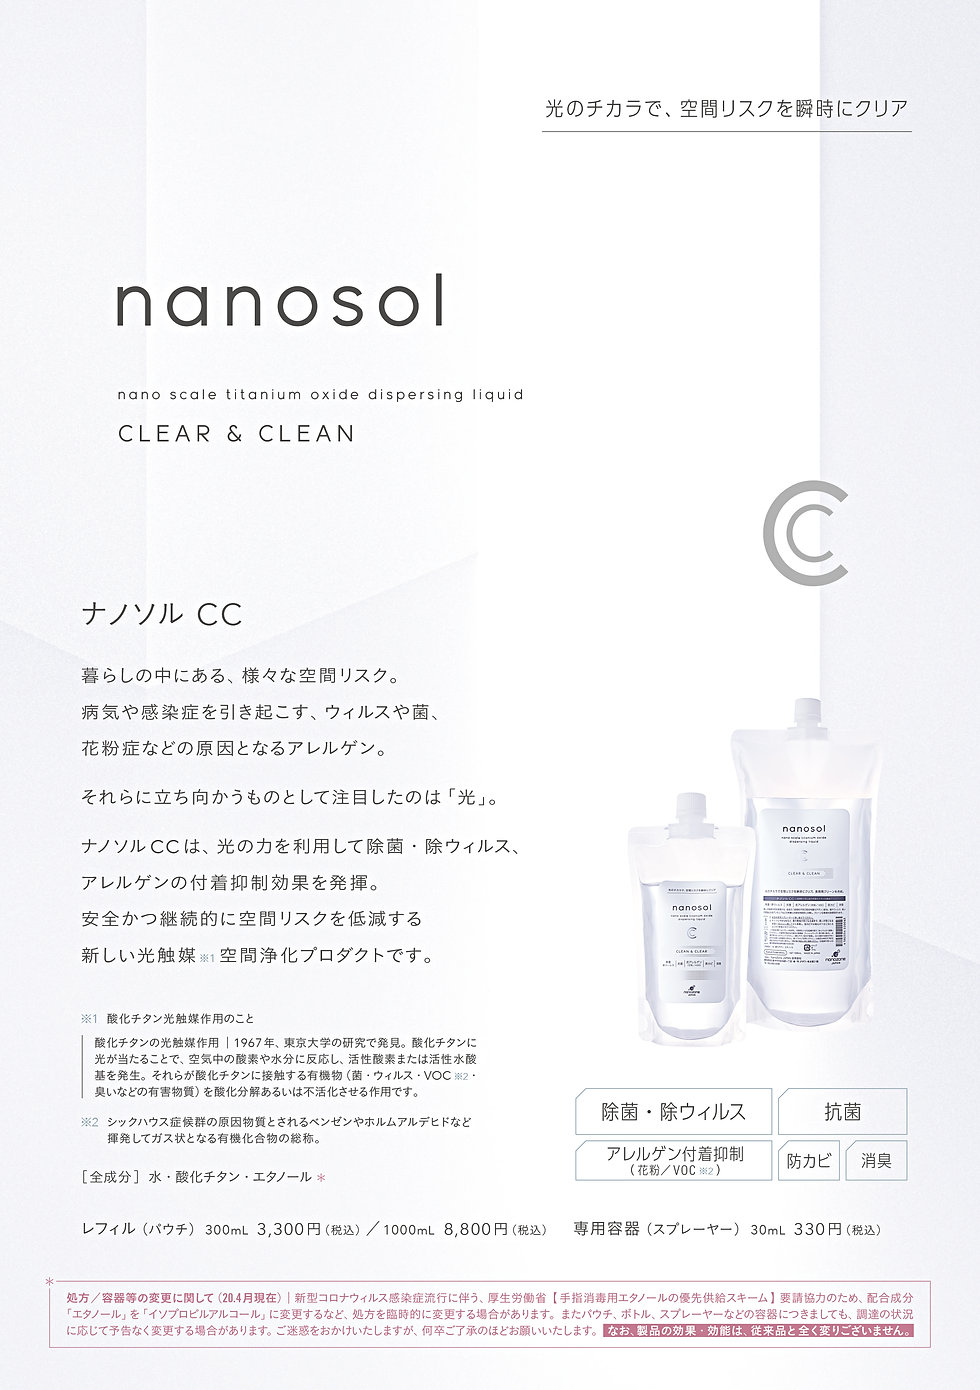 nanosol_001.jpg